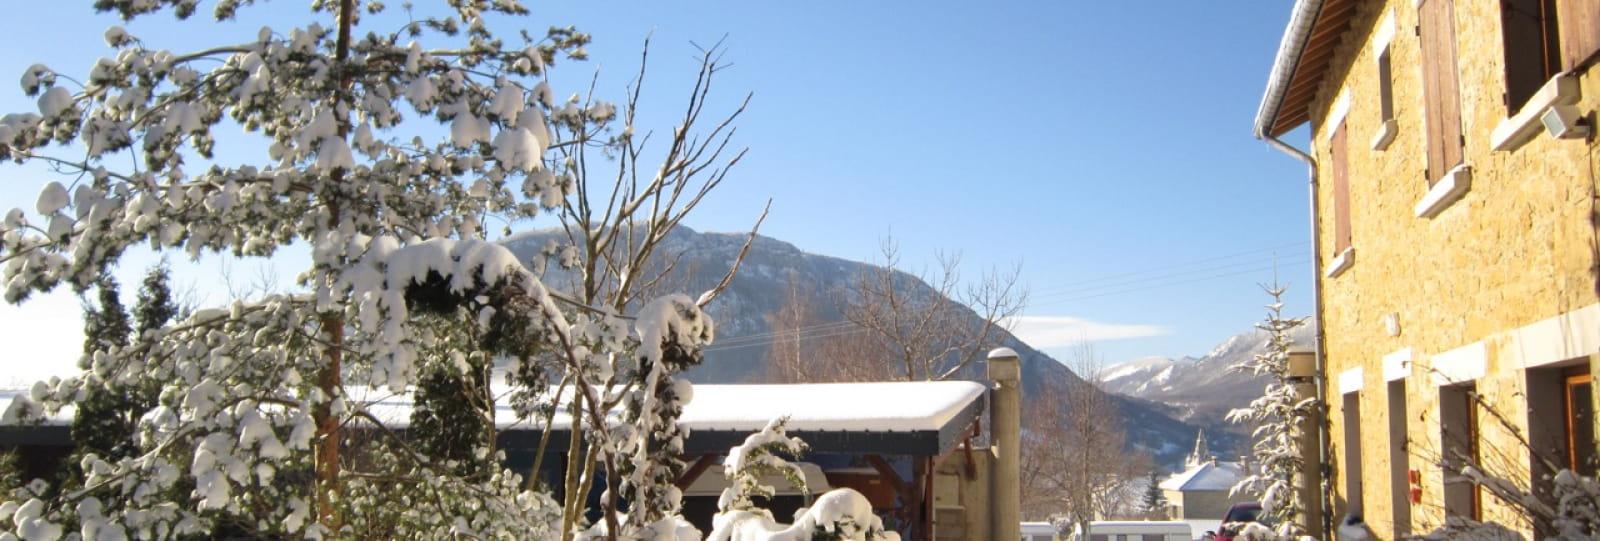 Centre de vacances Vercors IDDJ neige